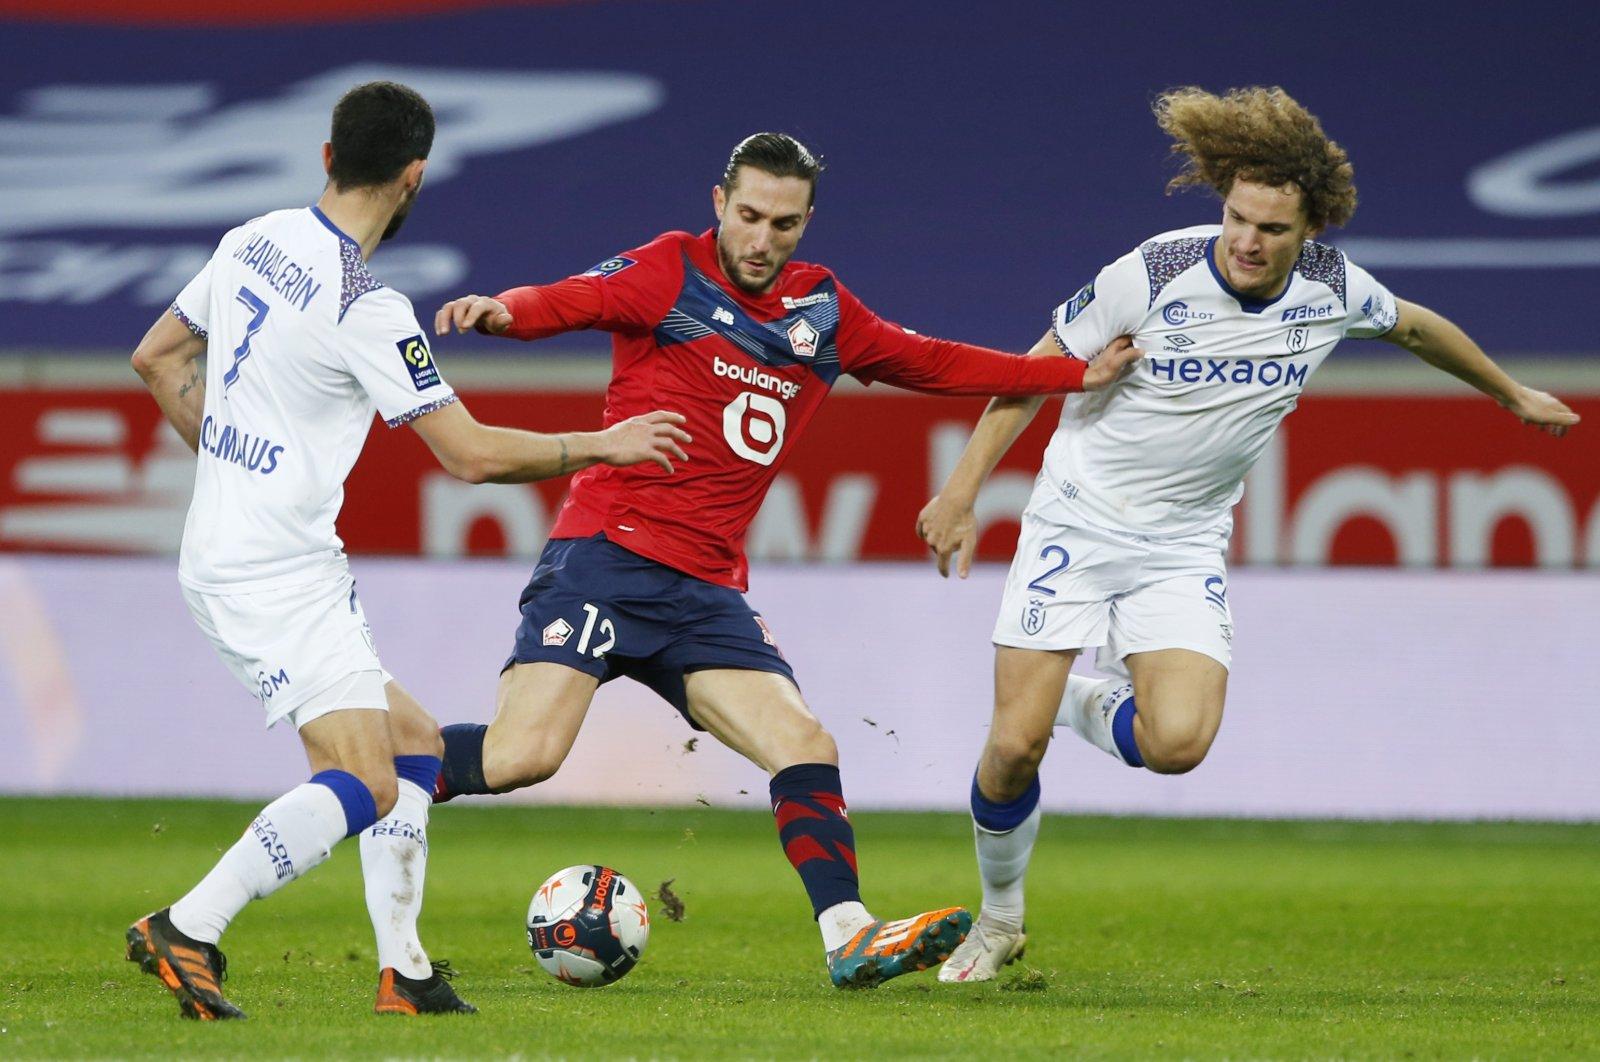 Lille's Yusuf Yazıcı (C) in action against Stade de Reims, Stade Pierre-Mauroy, Lille, France, Jan. 17, 2021. (Reuters Photo)